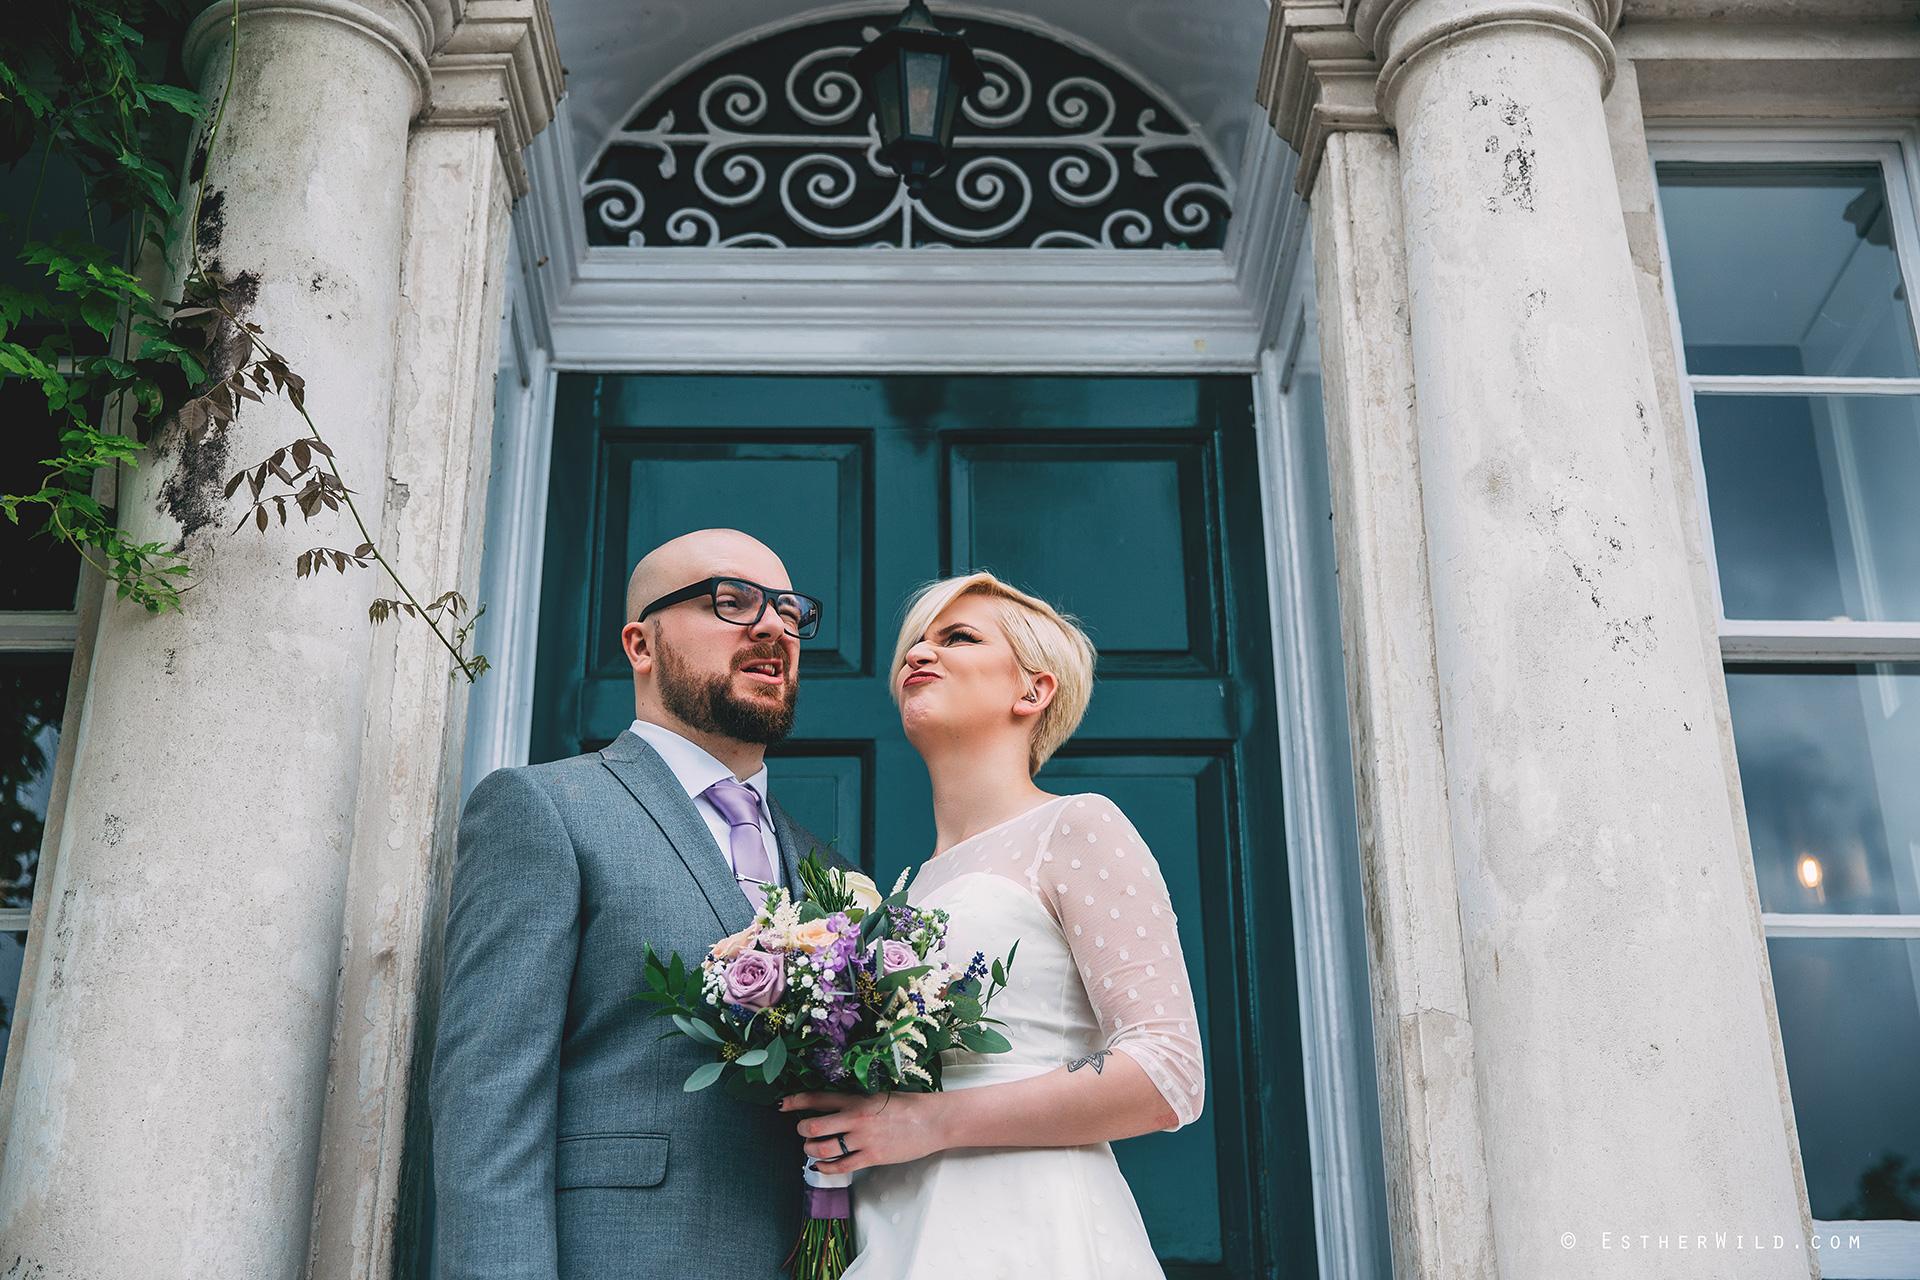 0617_London_Croydon_Clapham_Wedding_Photographer_Esther_Wild_Photography_IMG_5802.jpg